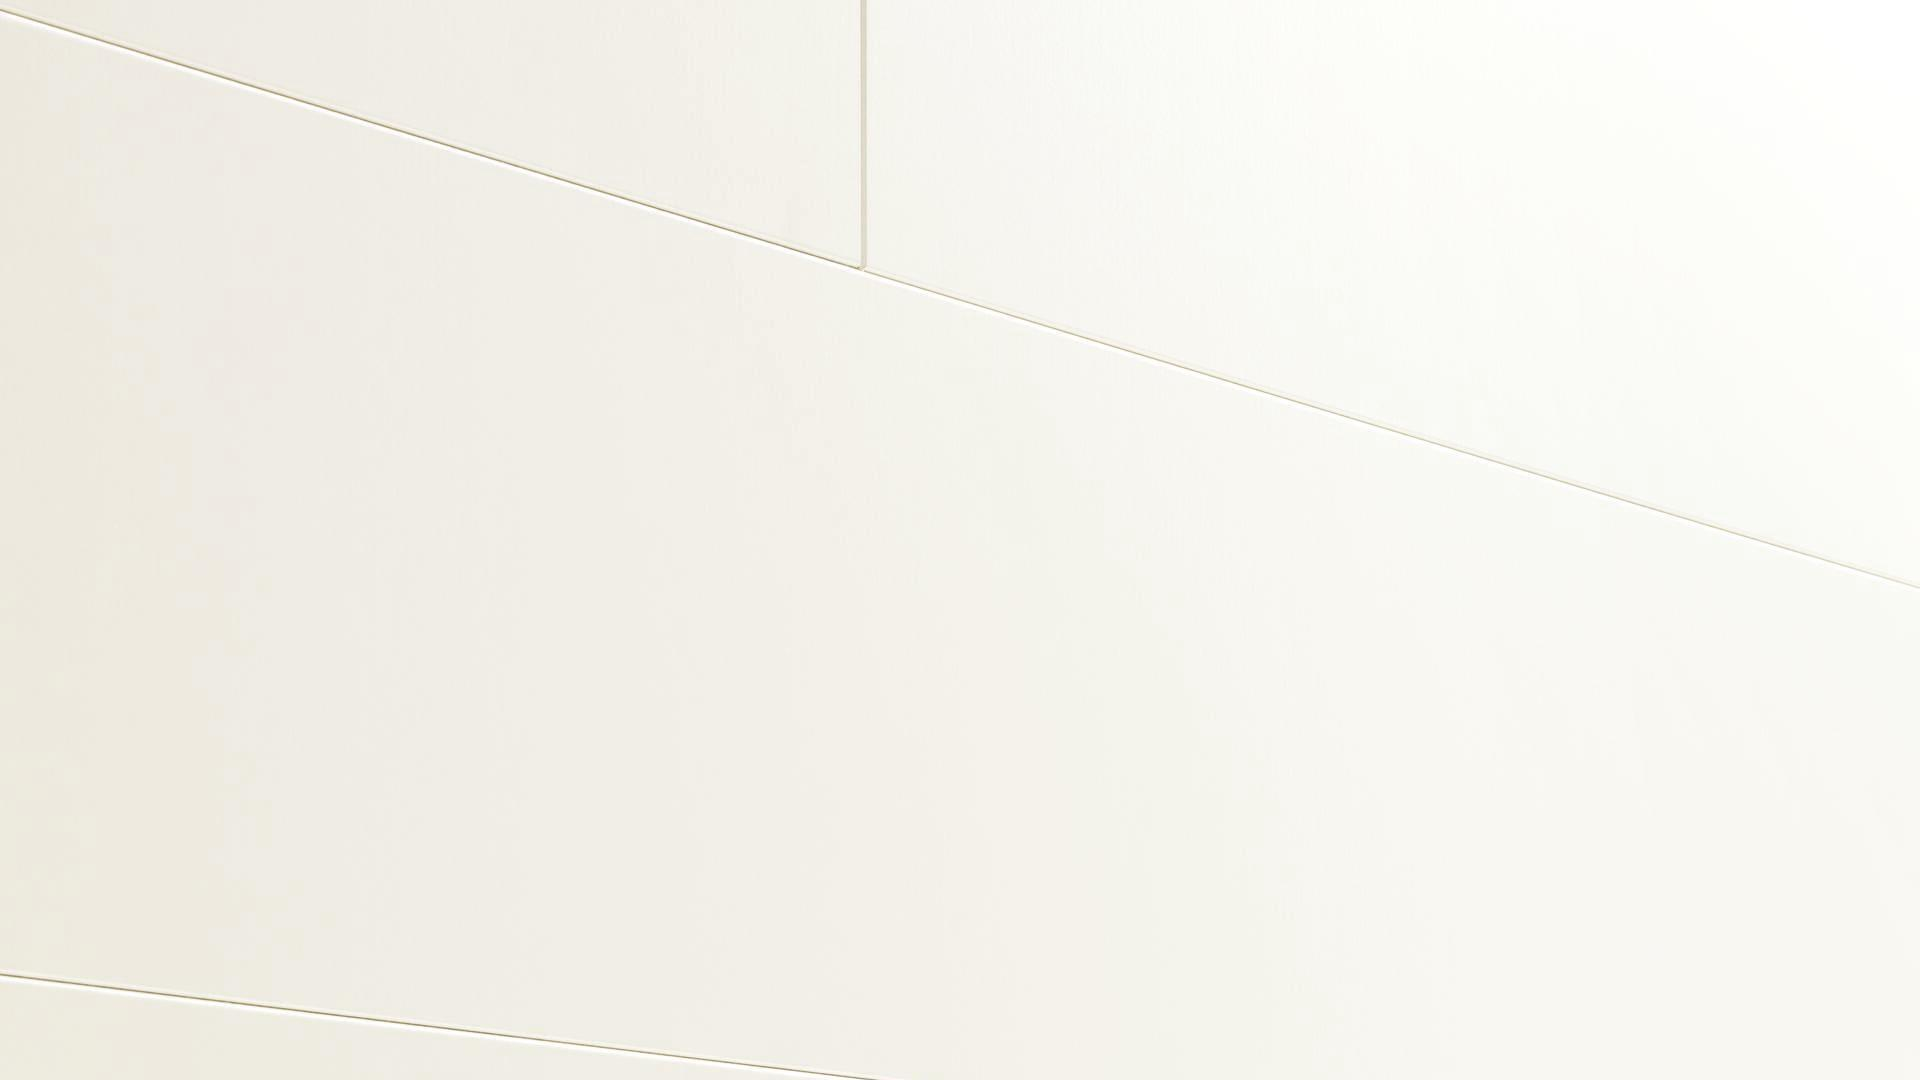 Dekorpaneele MeisterPaneele. bocado DP 250 Uni weiß glänzend DF 324